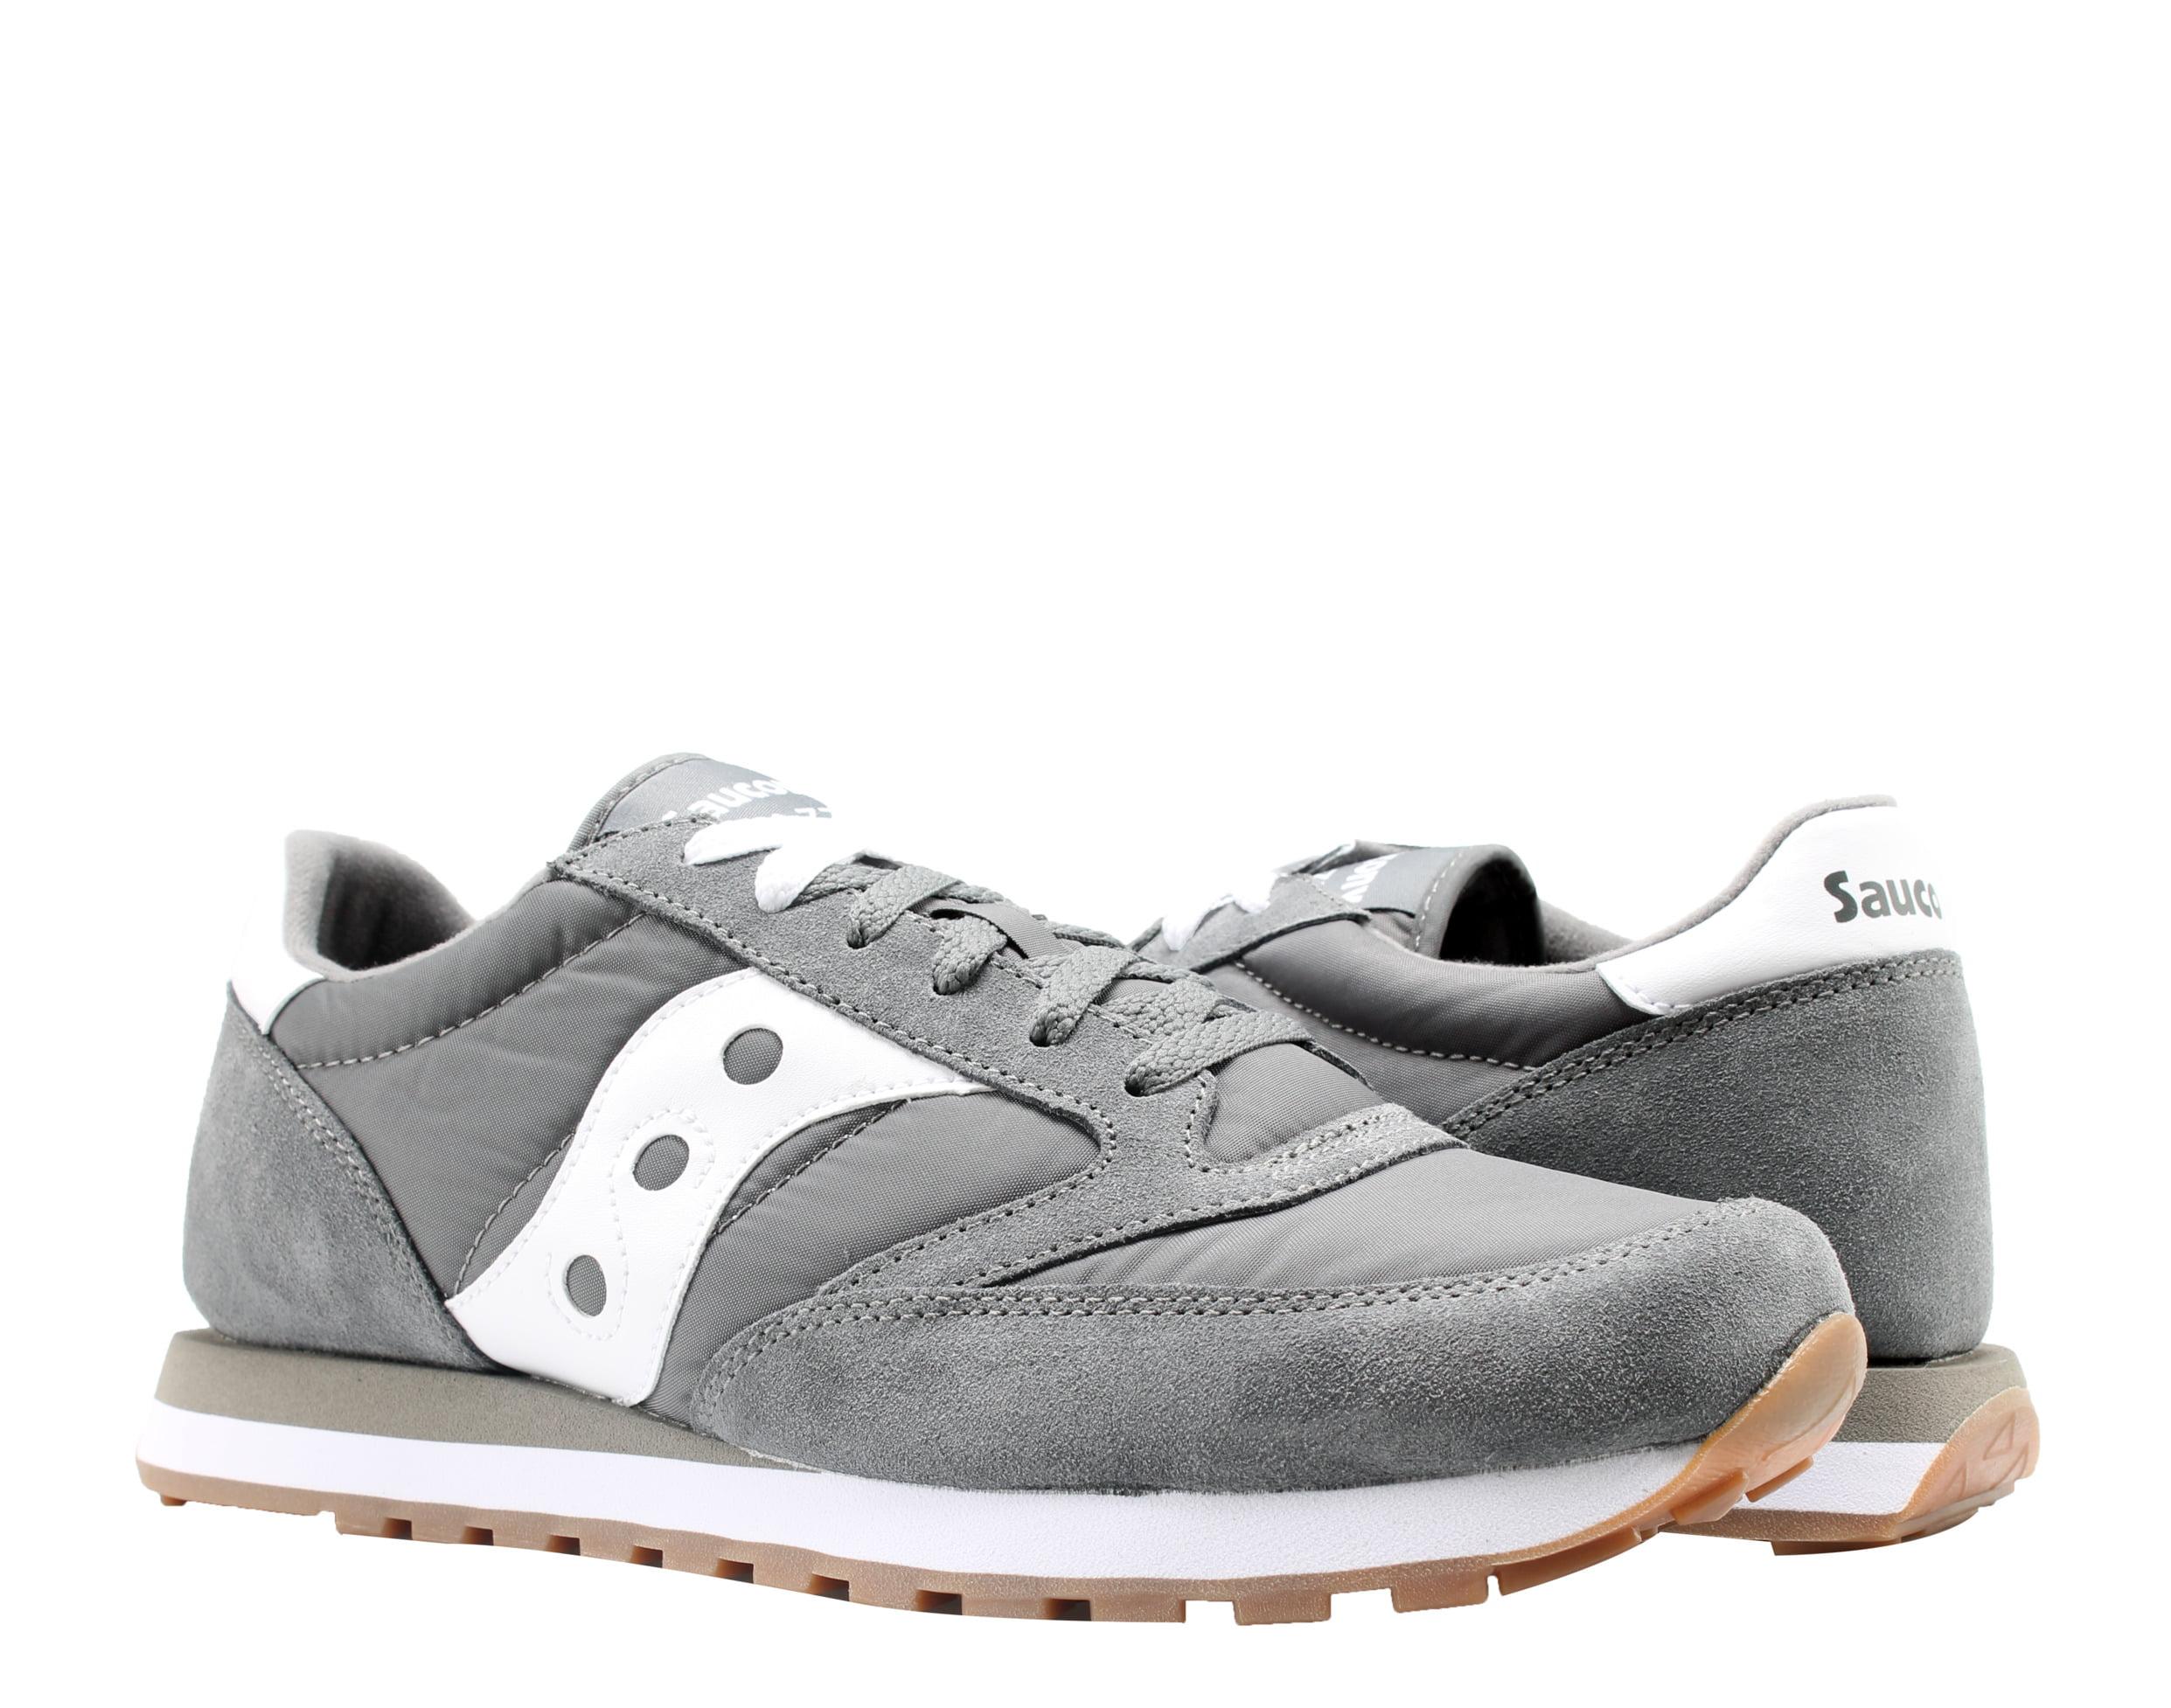 timeless design 574e8 12578 Saucony Jazz Original Grey/White Men's Running Shoes S2044-434